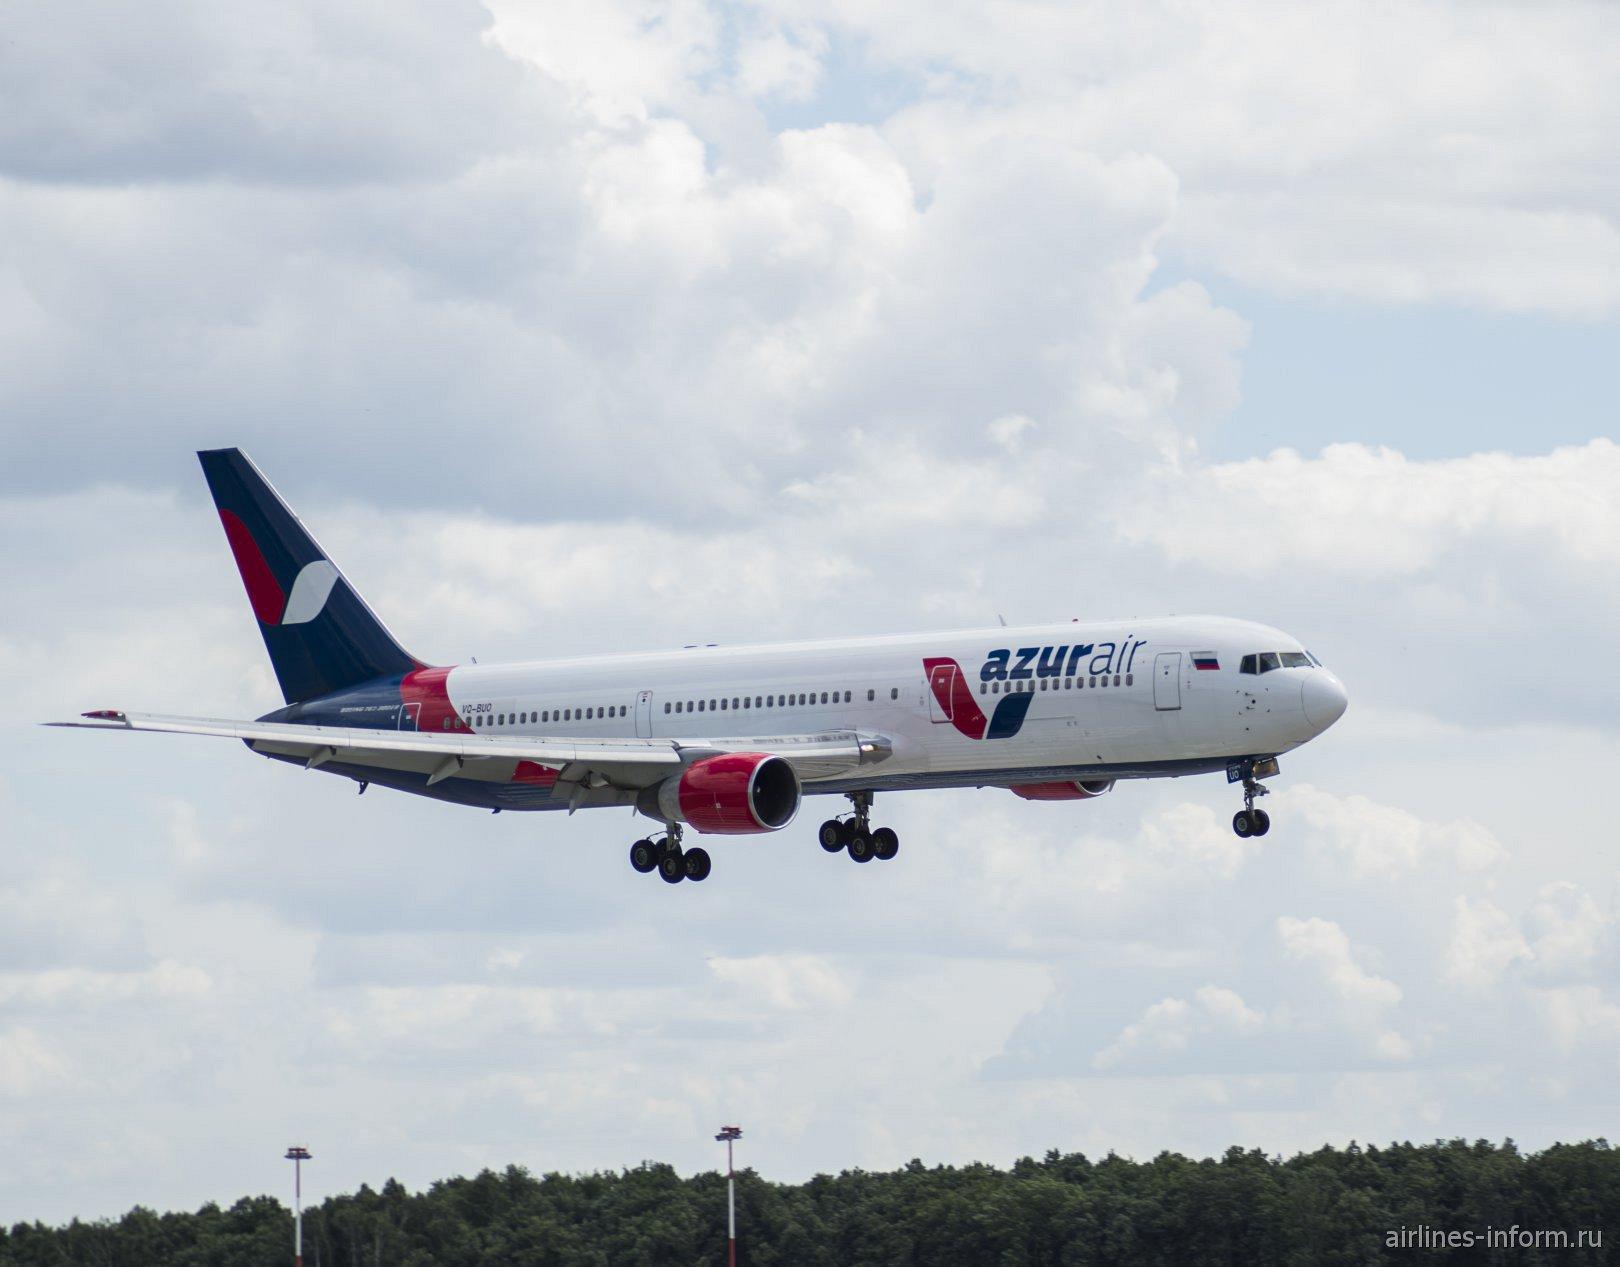 Боинг-767-300 VQ-BUO авиакомпании Azur Air перед посадкой в аэропорту Внуково